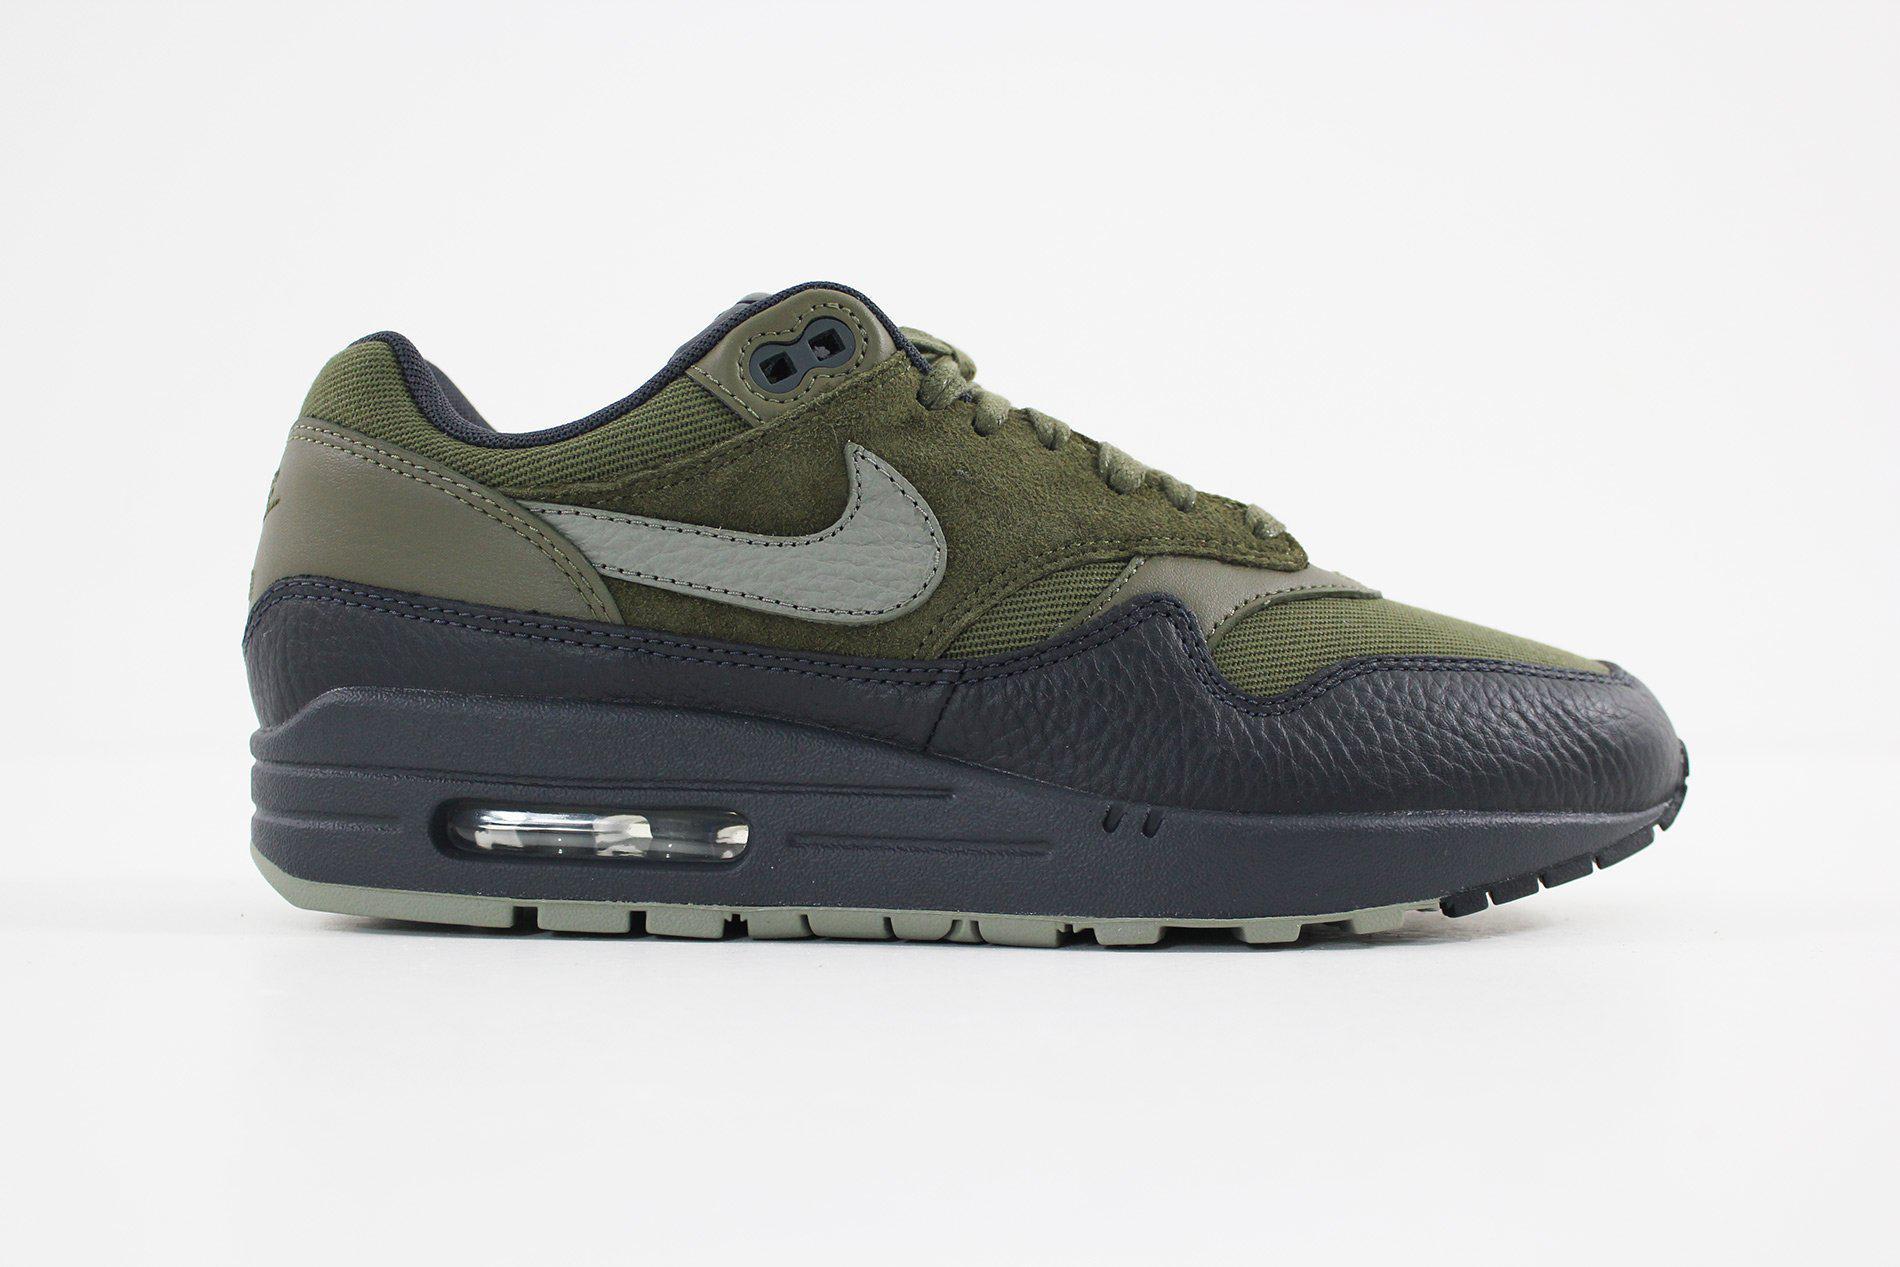 55a6c7539e Lyst - Nike Men's Air Max 1 Premium Shoe 875844-201 in Green for Men